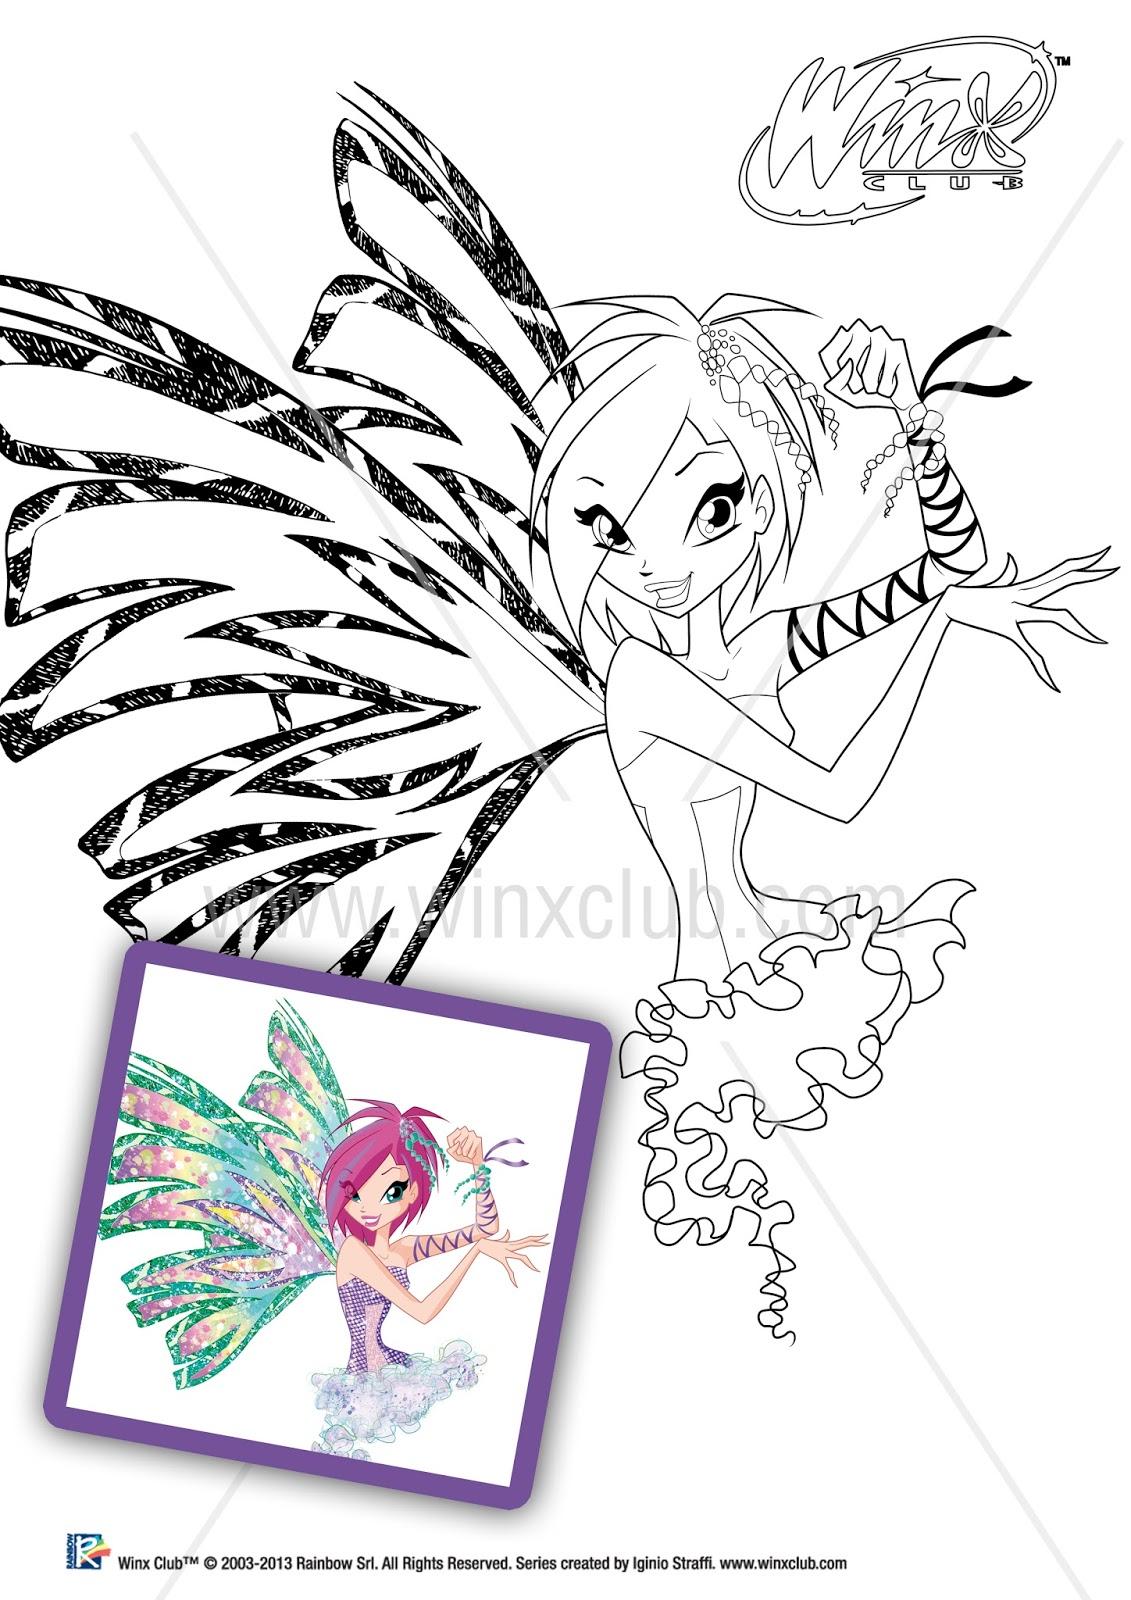 imagens para colorir das winx - Desenhos do CLUBE DAS WINX para colorir Hello Kids